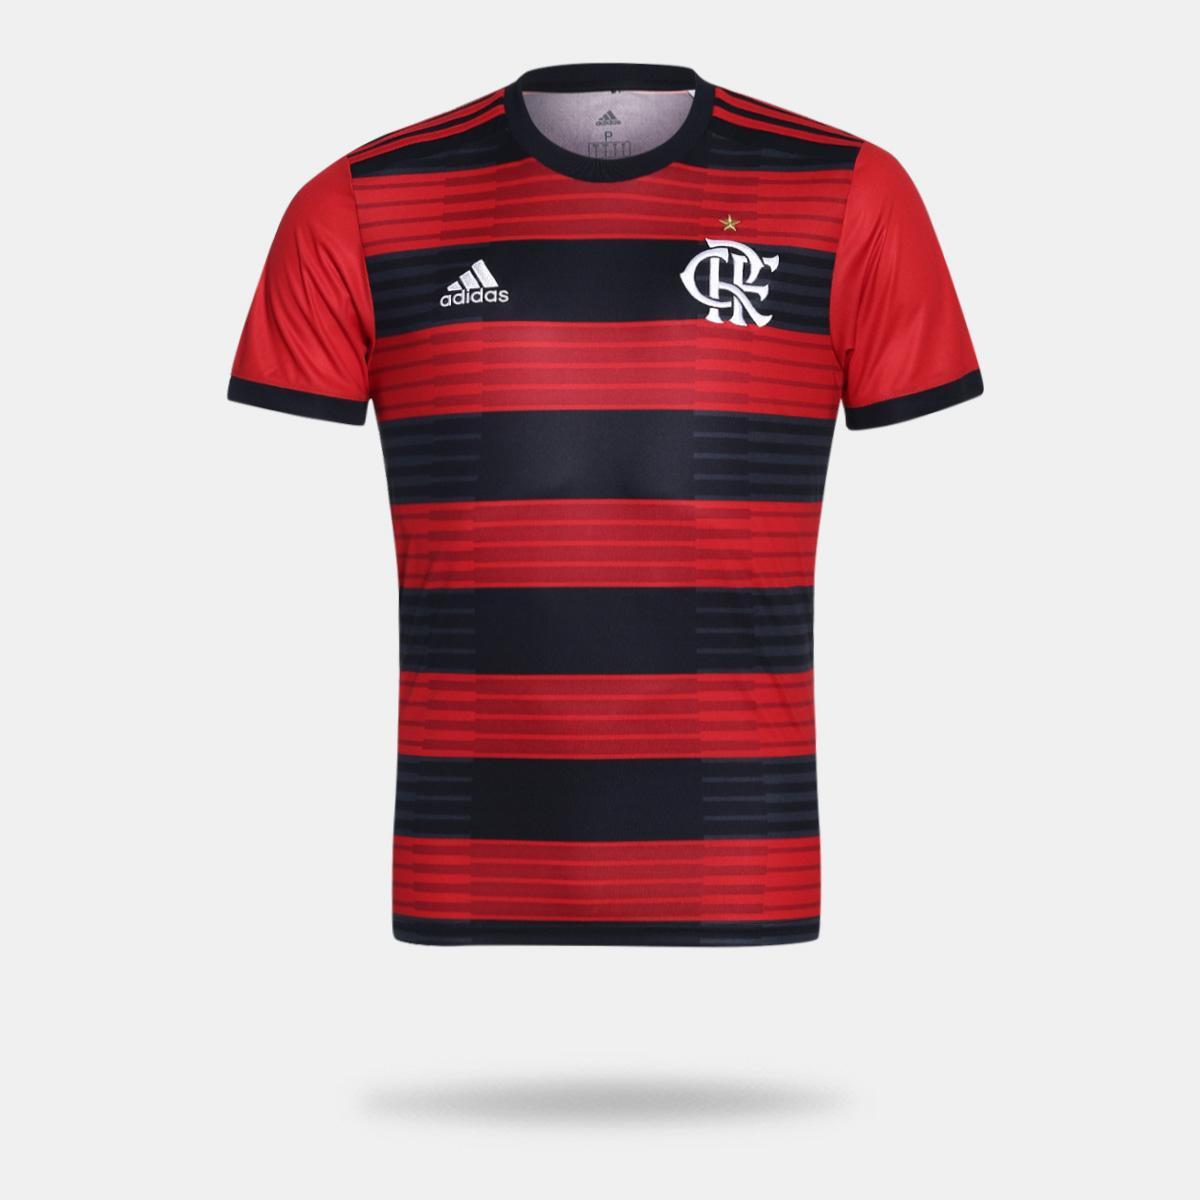 Camisa Flamengo I 2018 s n° Torcedor Adidas Masculina  24f5a2af47ddc